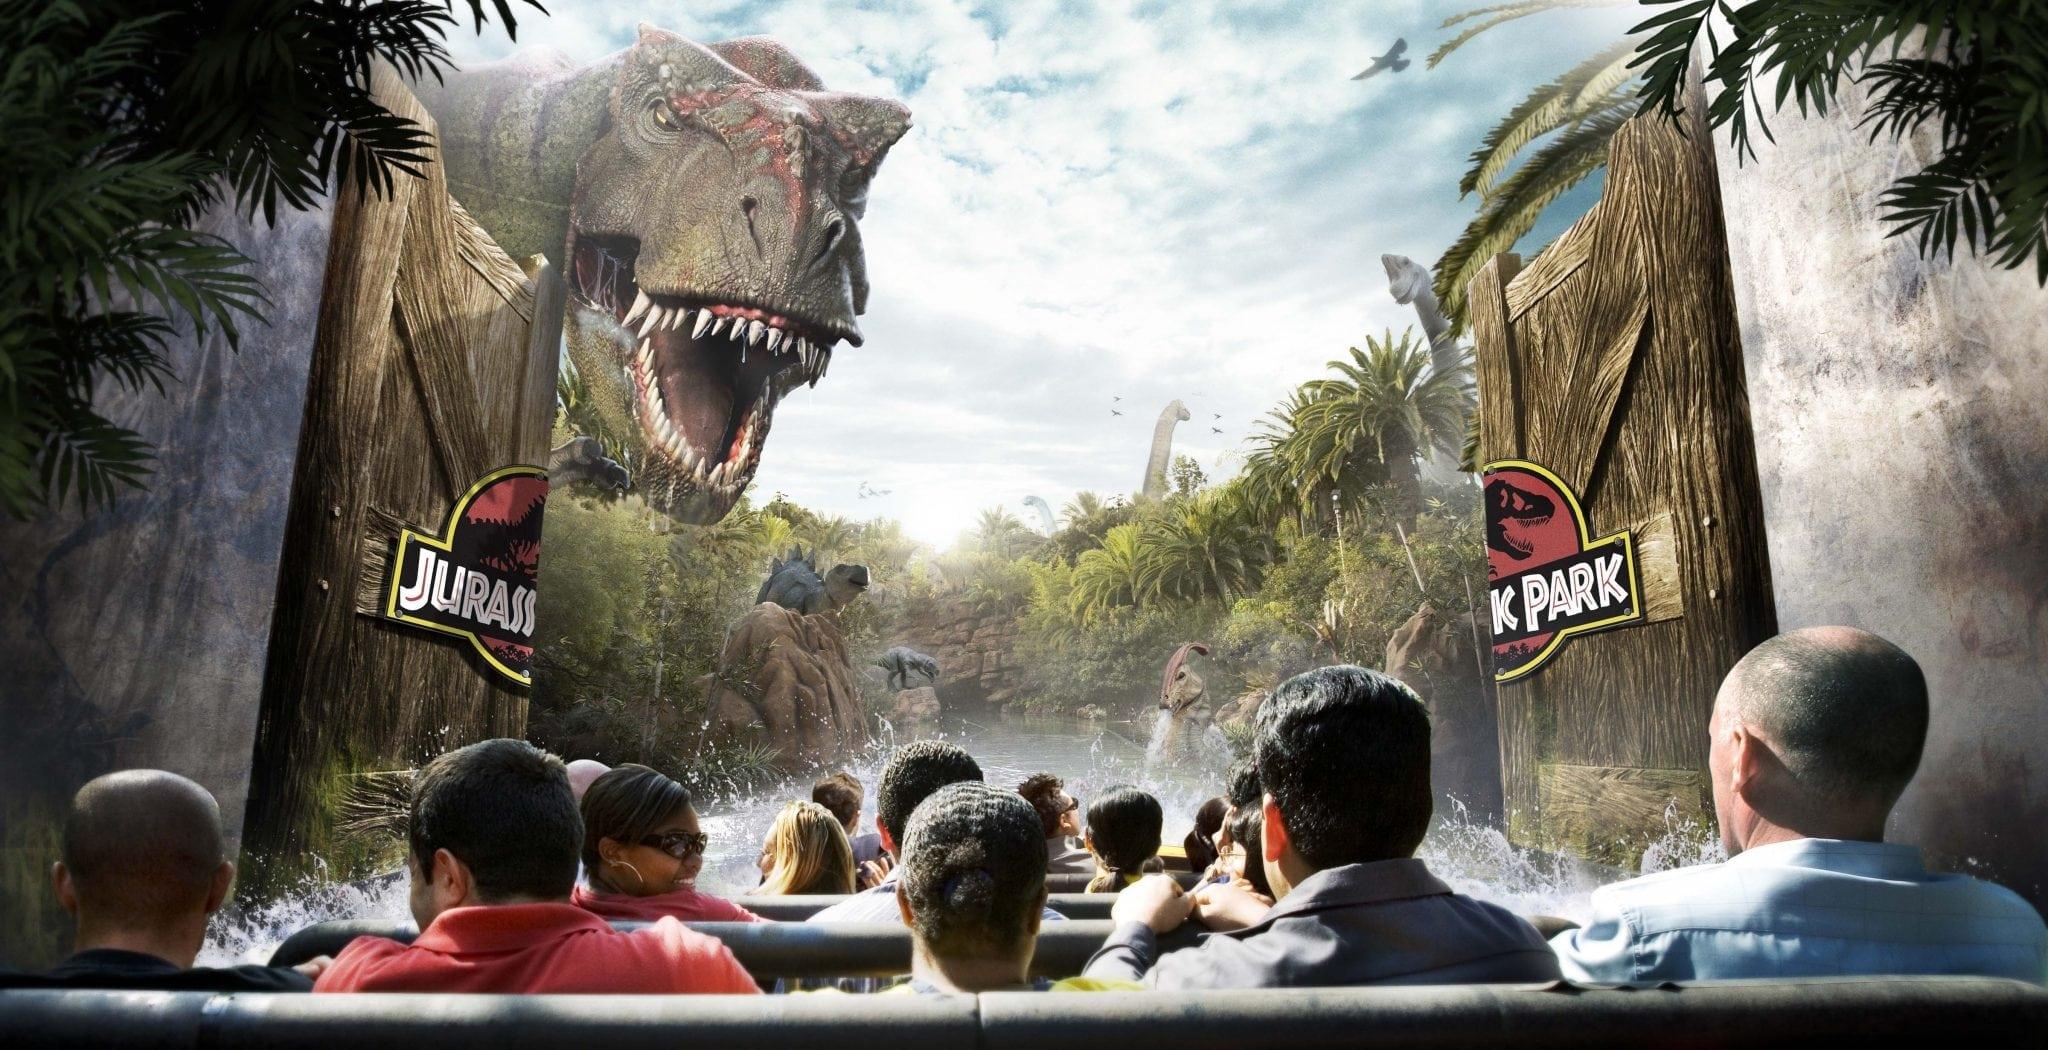 Jurassic Park's 25th Anniversary Celebration